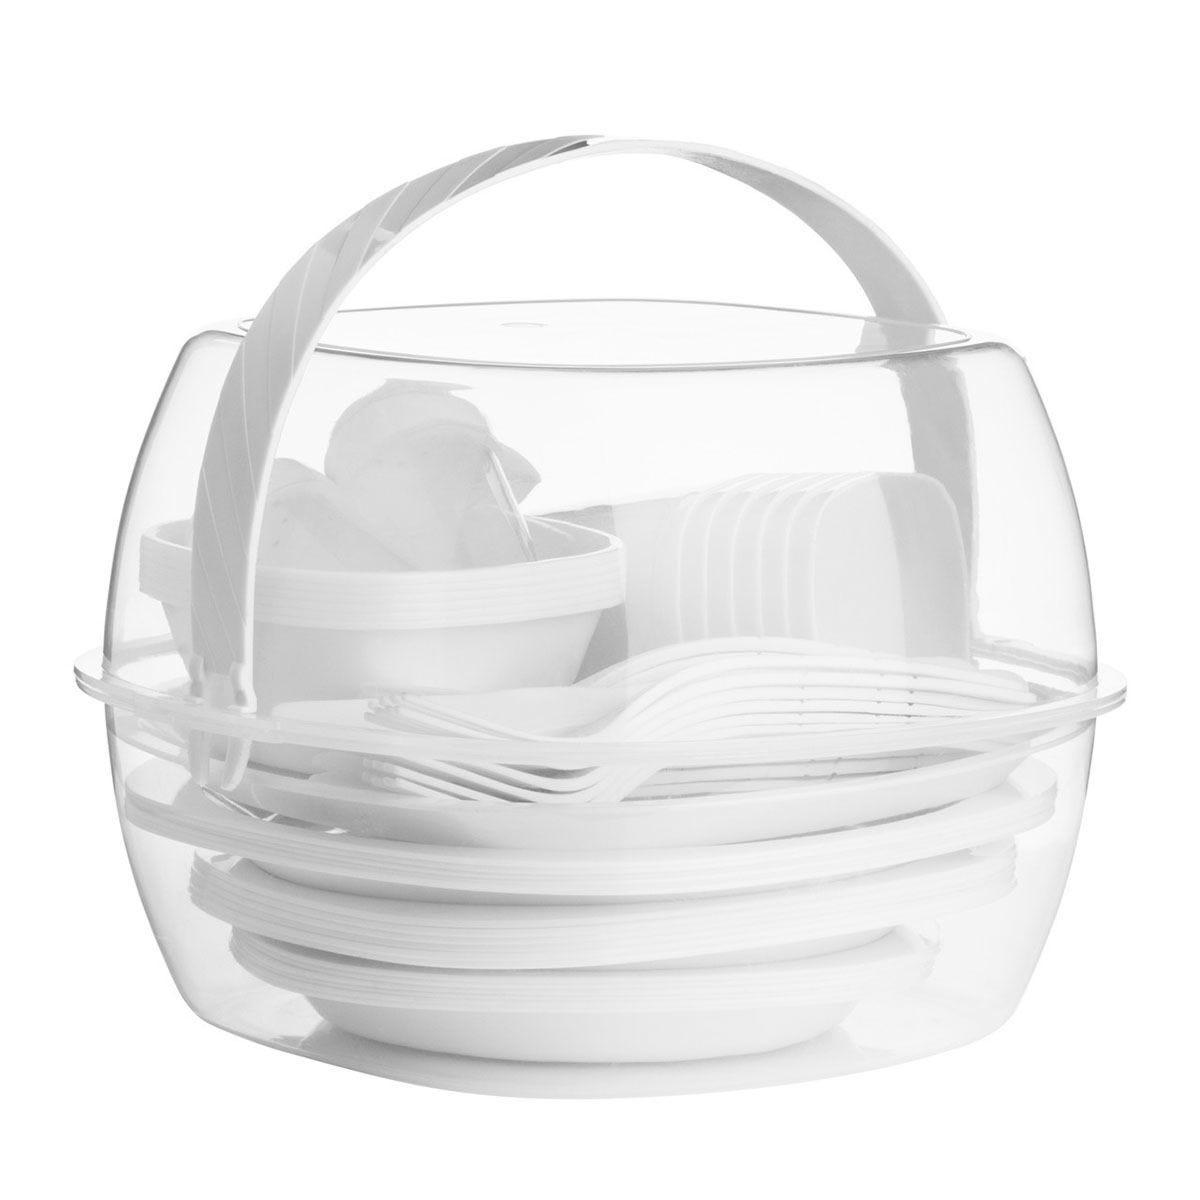 Essentials By Premier 51-Piece Picnic Set - White